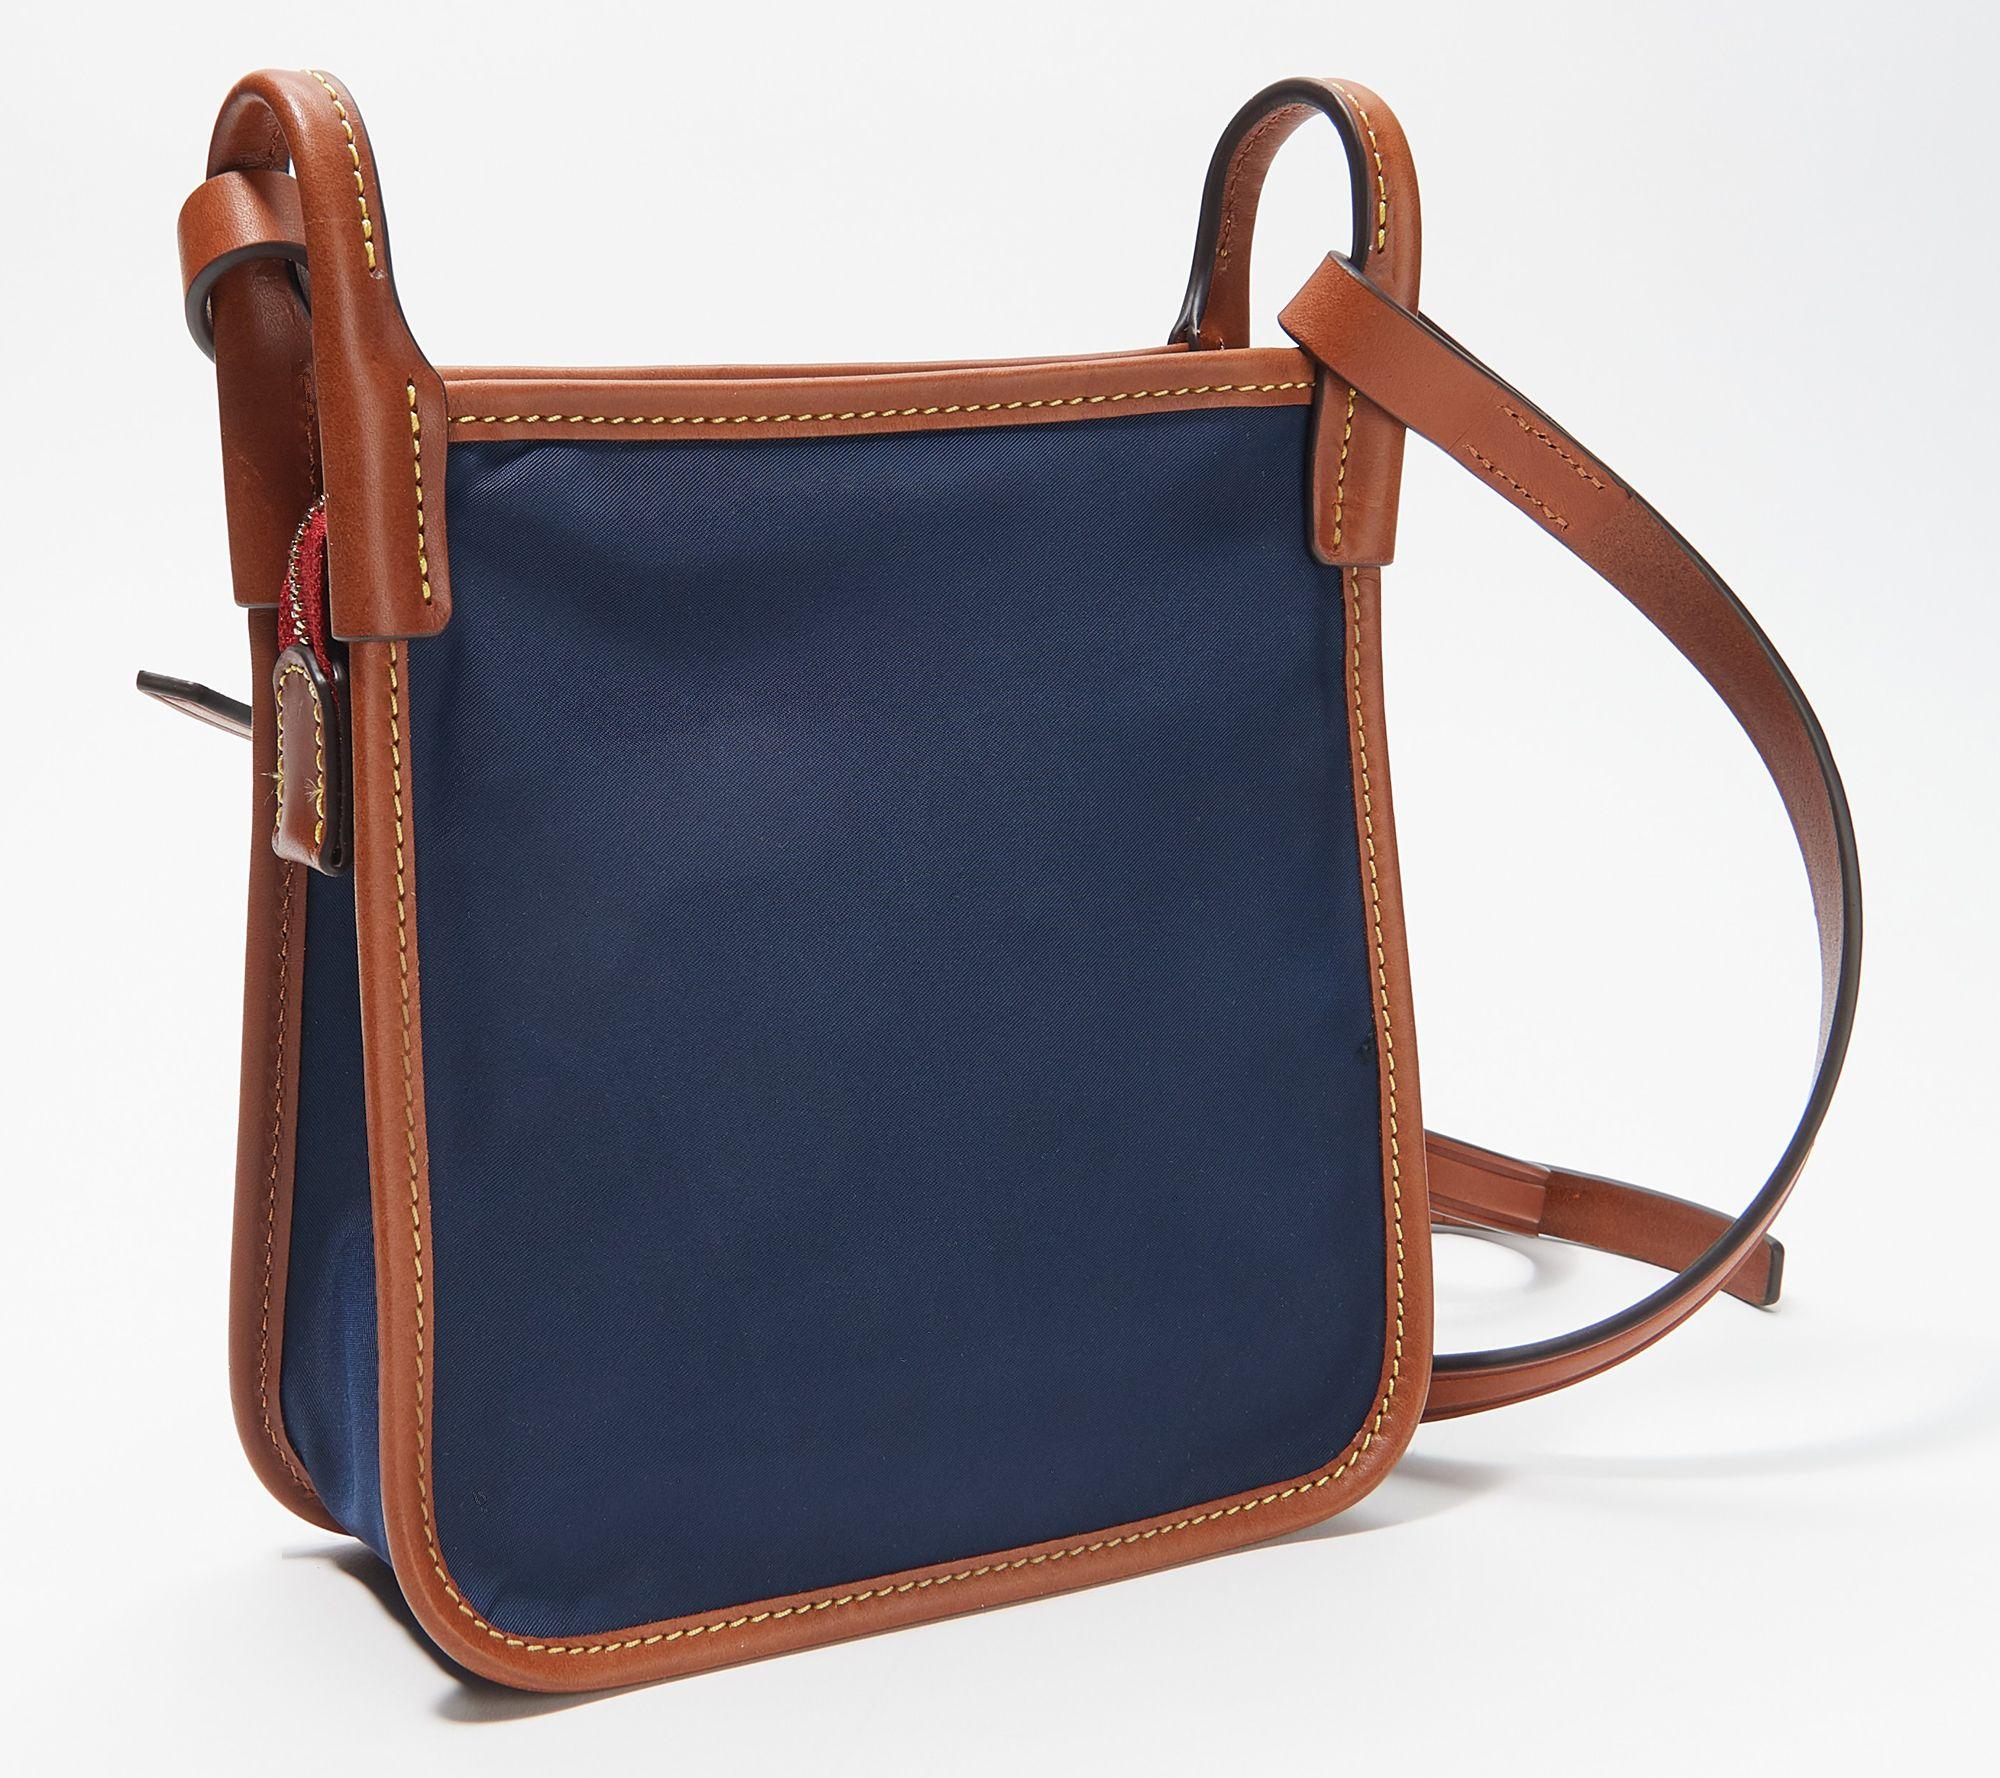 Dooney /& Bourke Crossbody Red Nylon Letter Carrier Brown Leather Trim Top Zip